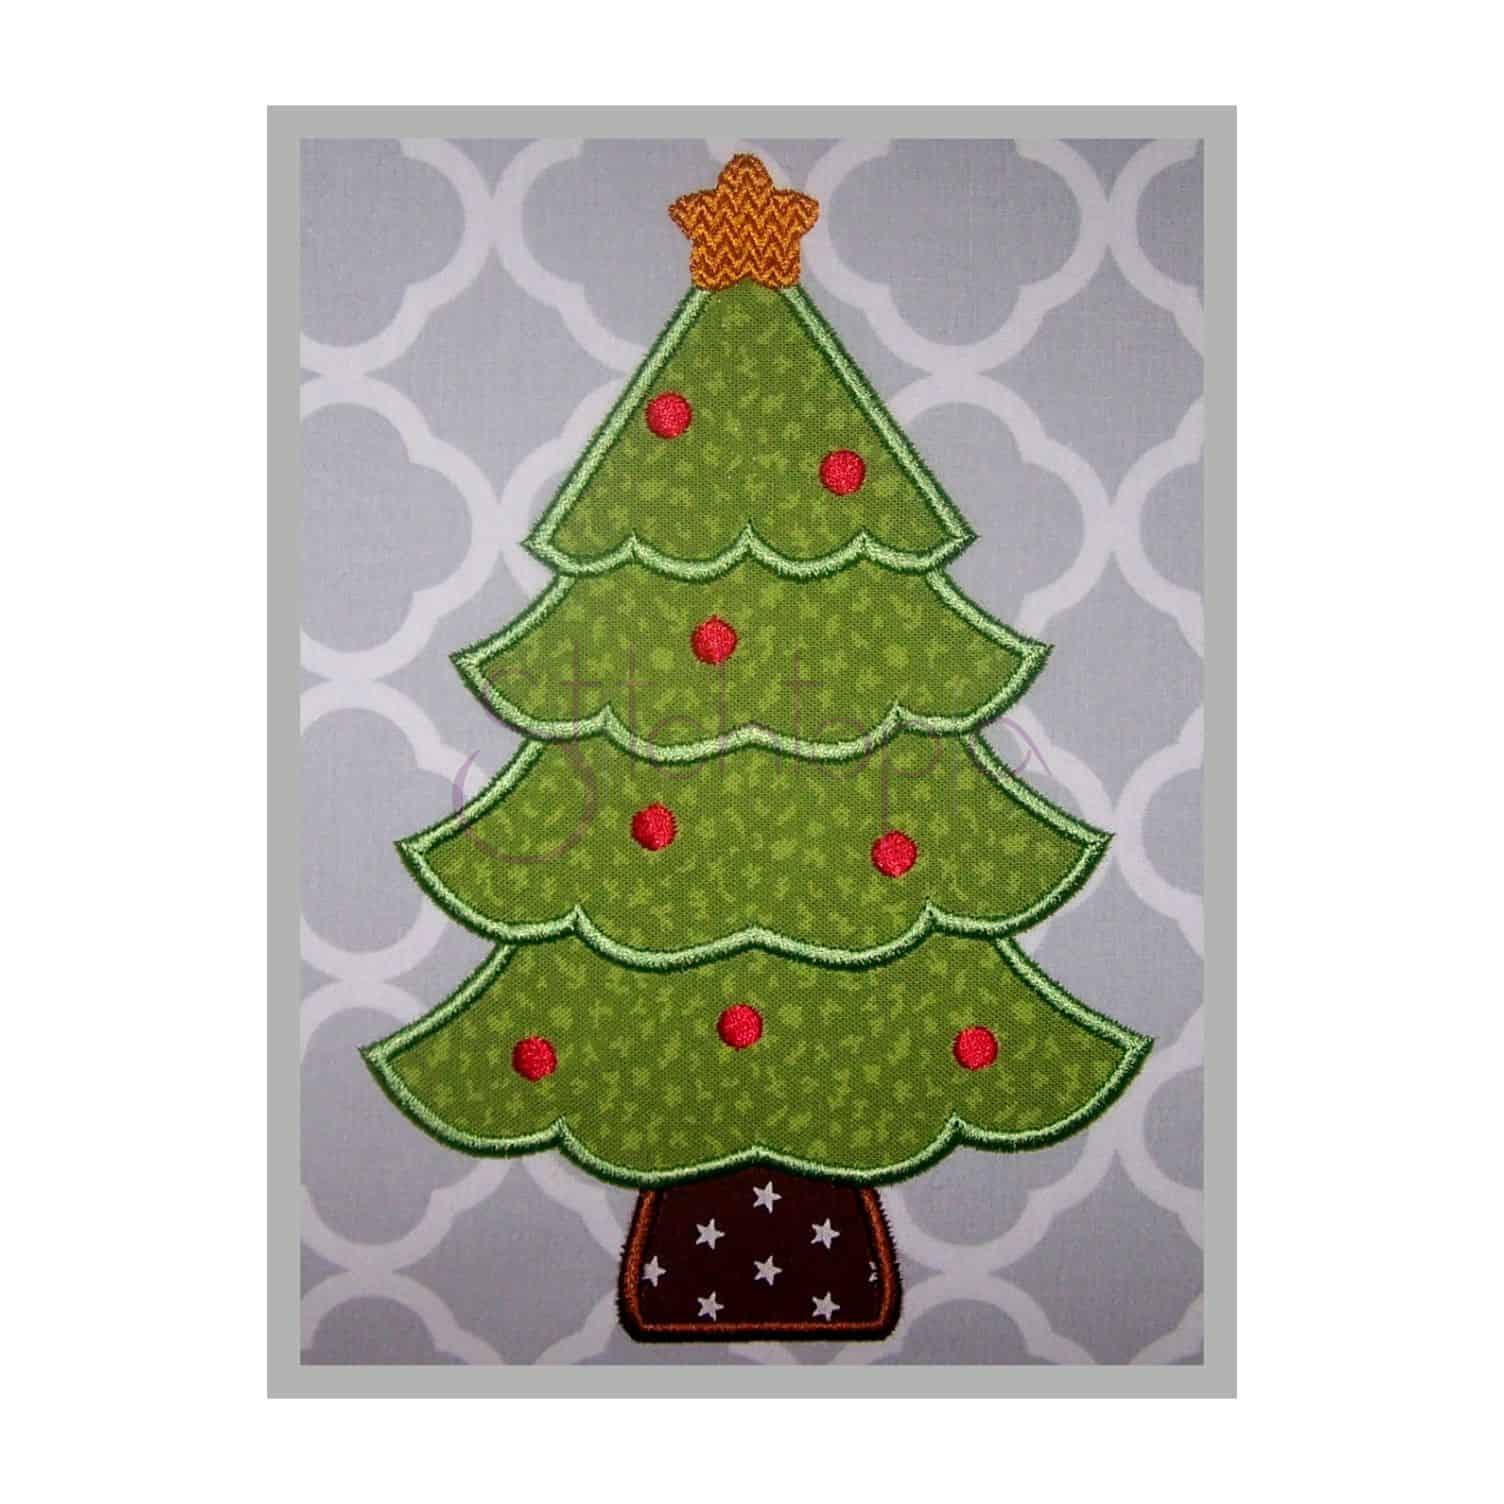 Christmas tree applique design stitchtopia for Appliques design